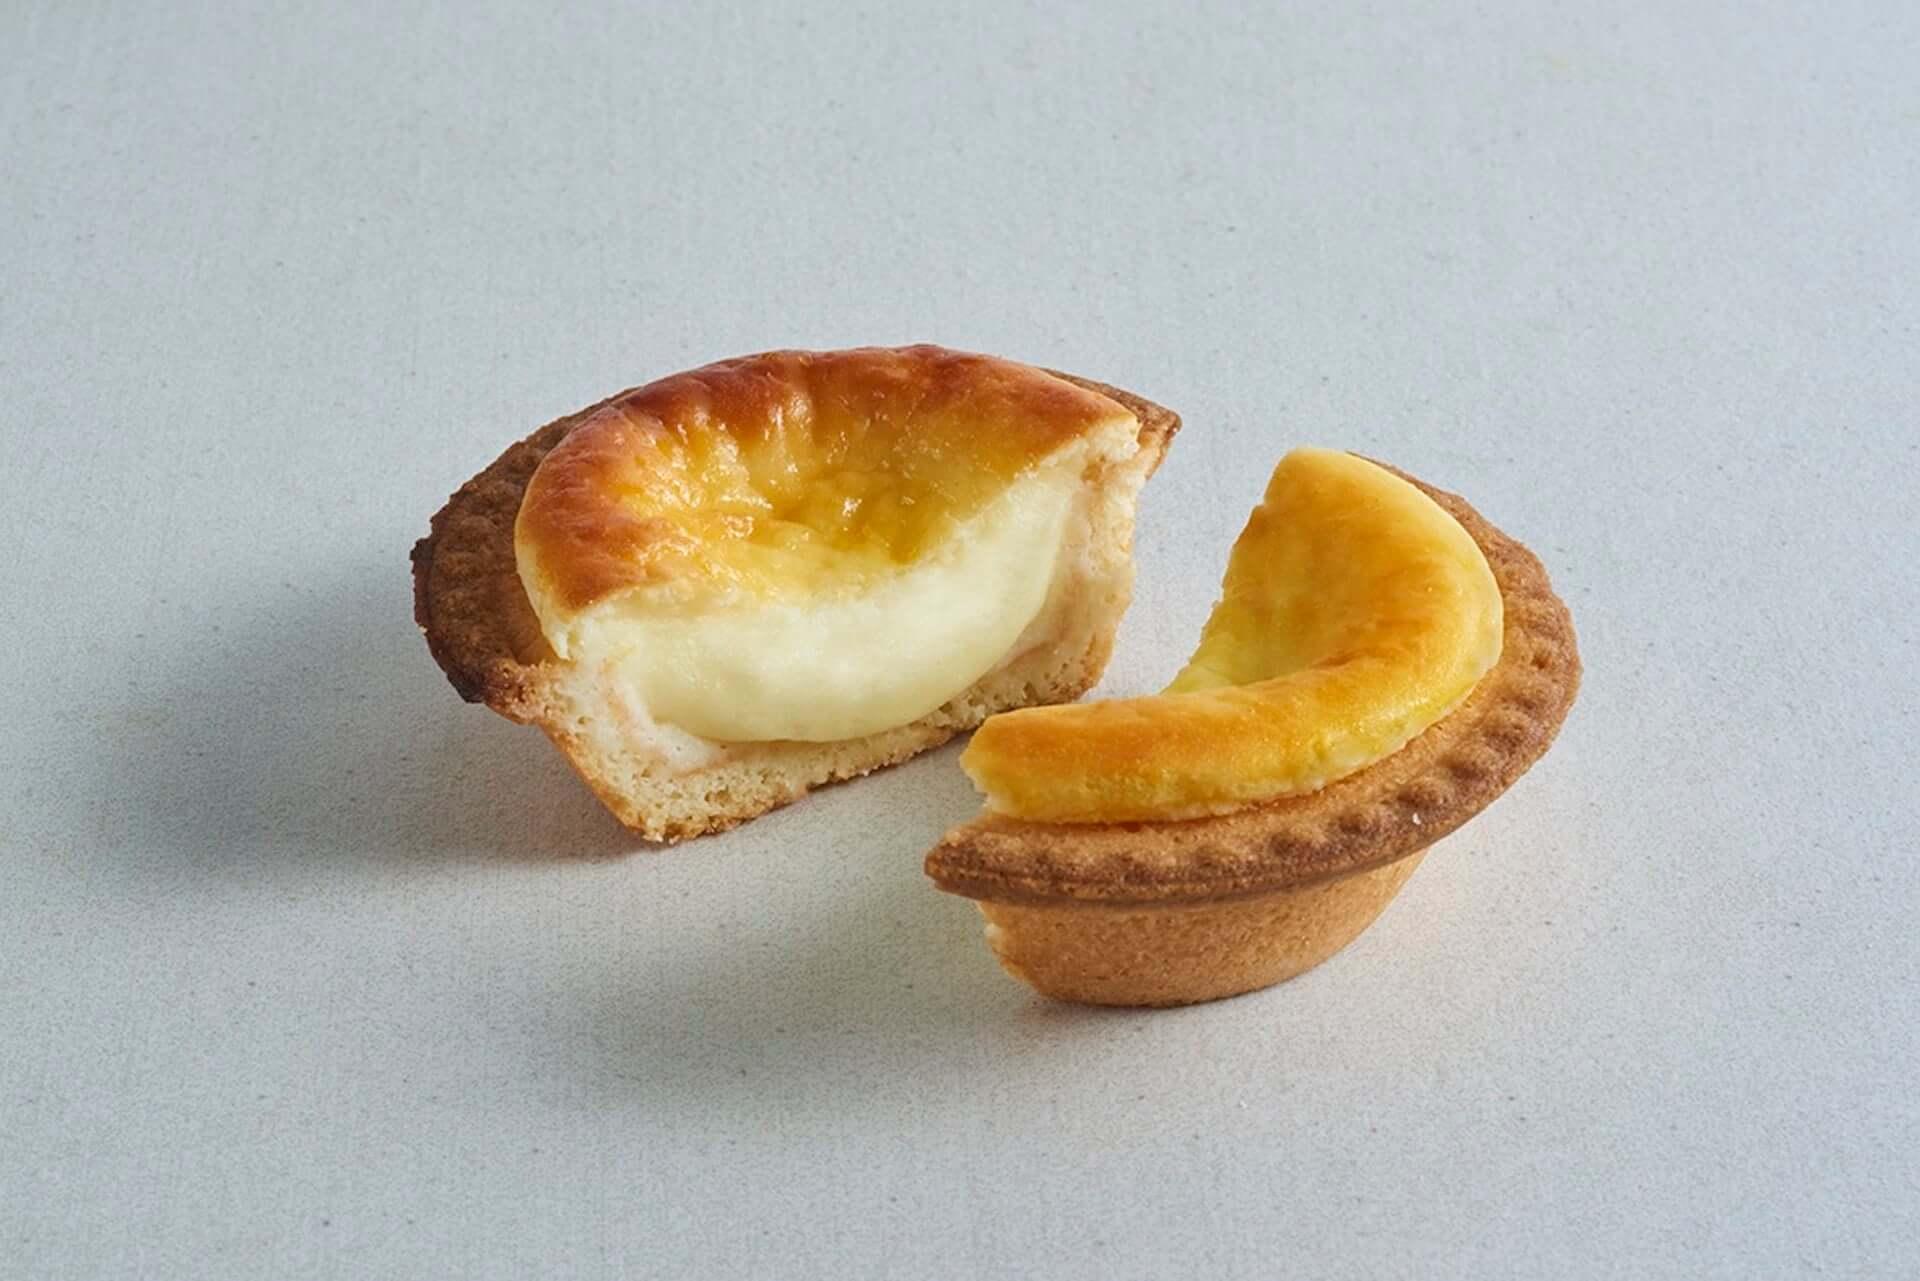 BAKE初の公式オンラインショップ「BAKE THE ONLINE」がオープン!チーズタルト10P BOXが50%OFFの特別価格に gourmet_bake_online_08-1920x1281